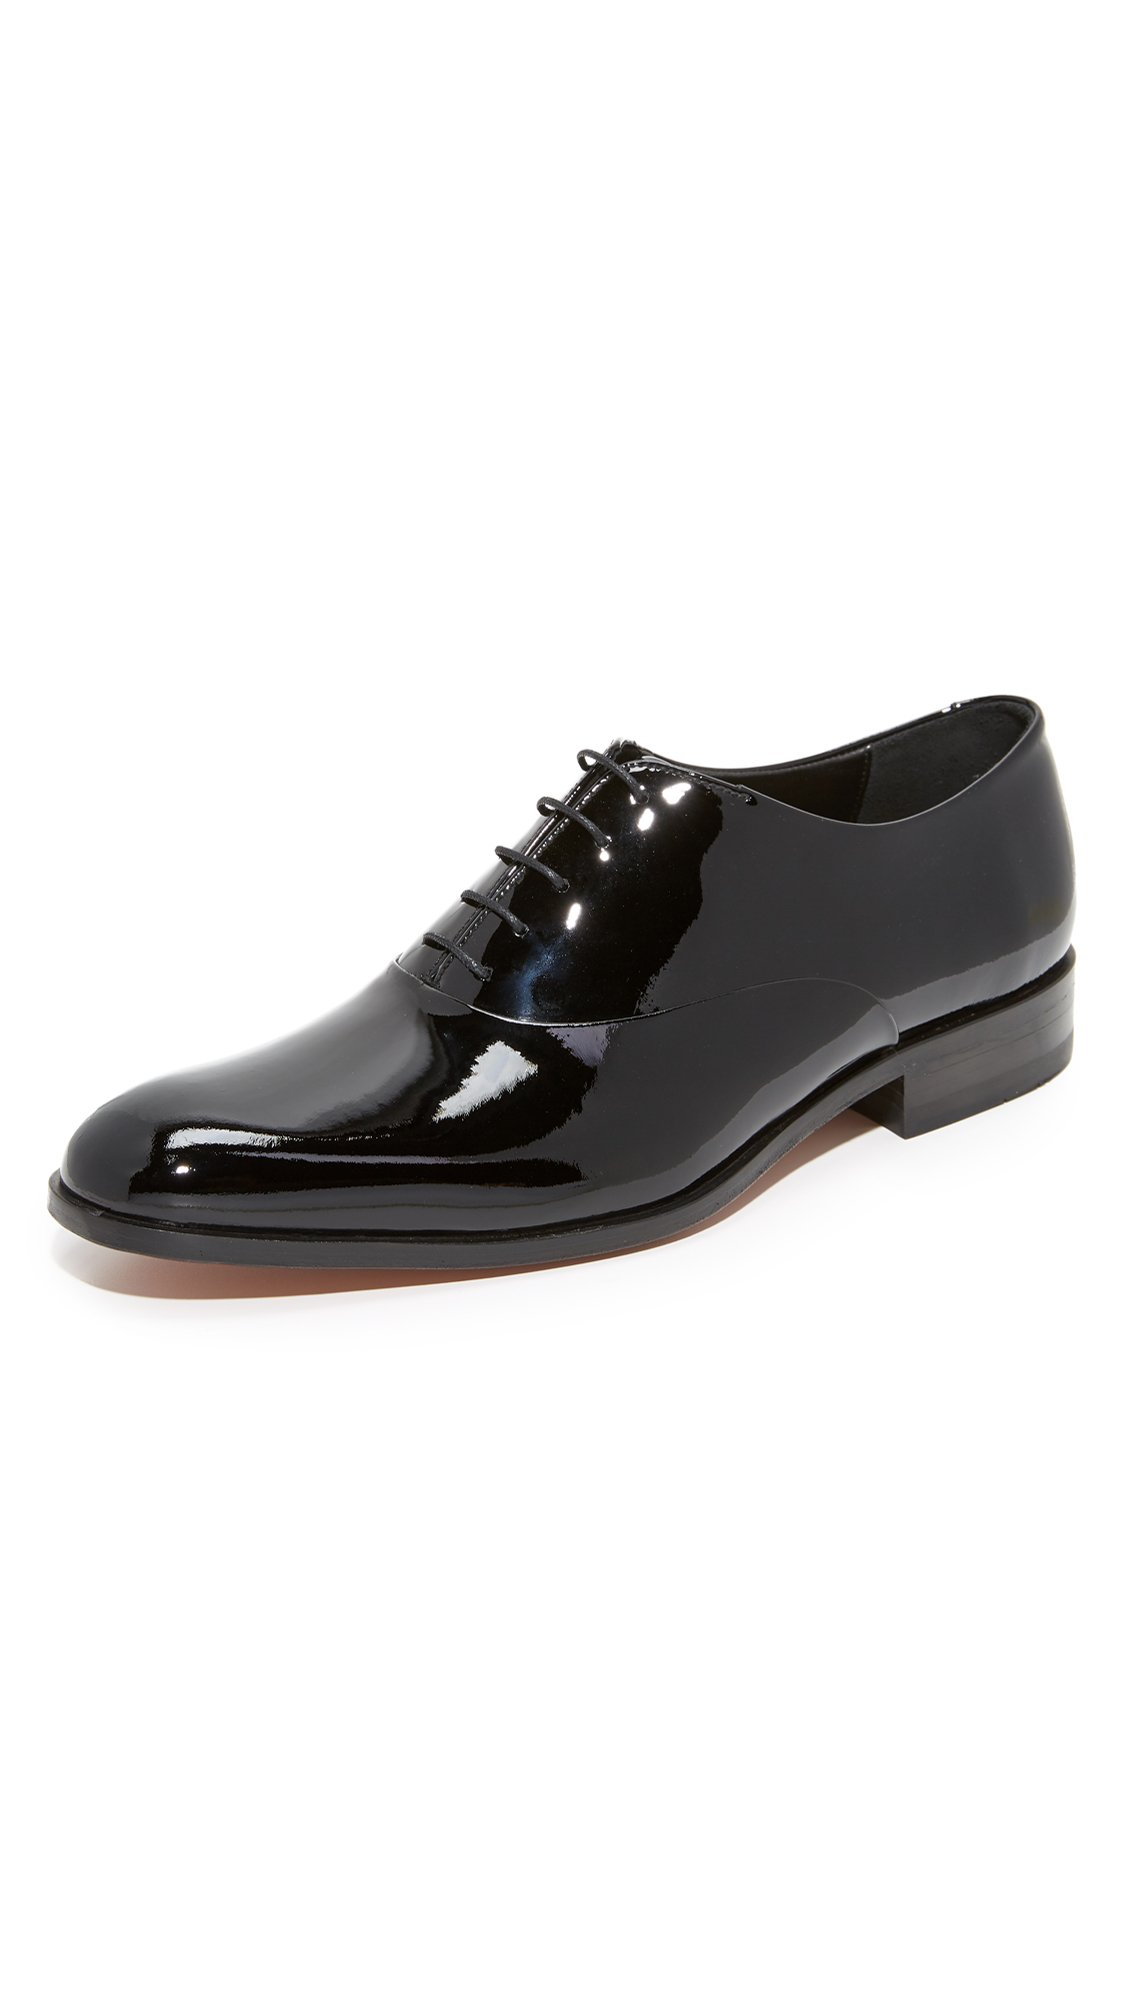 Loake Lifestyle Men's Patent Leather Oxfords, Black, 12 UK (13 D(M) US Men)